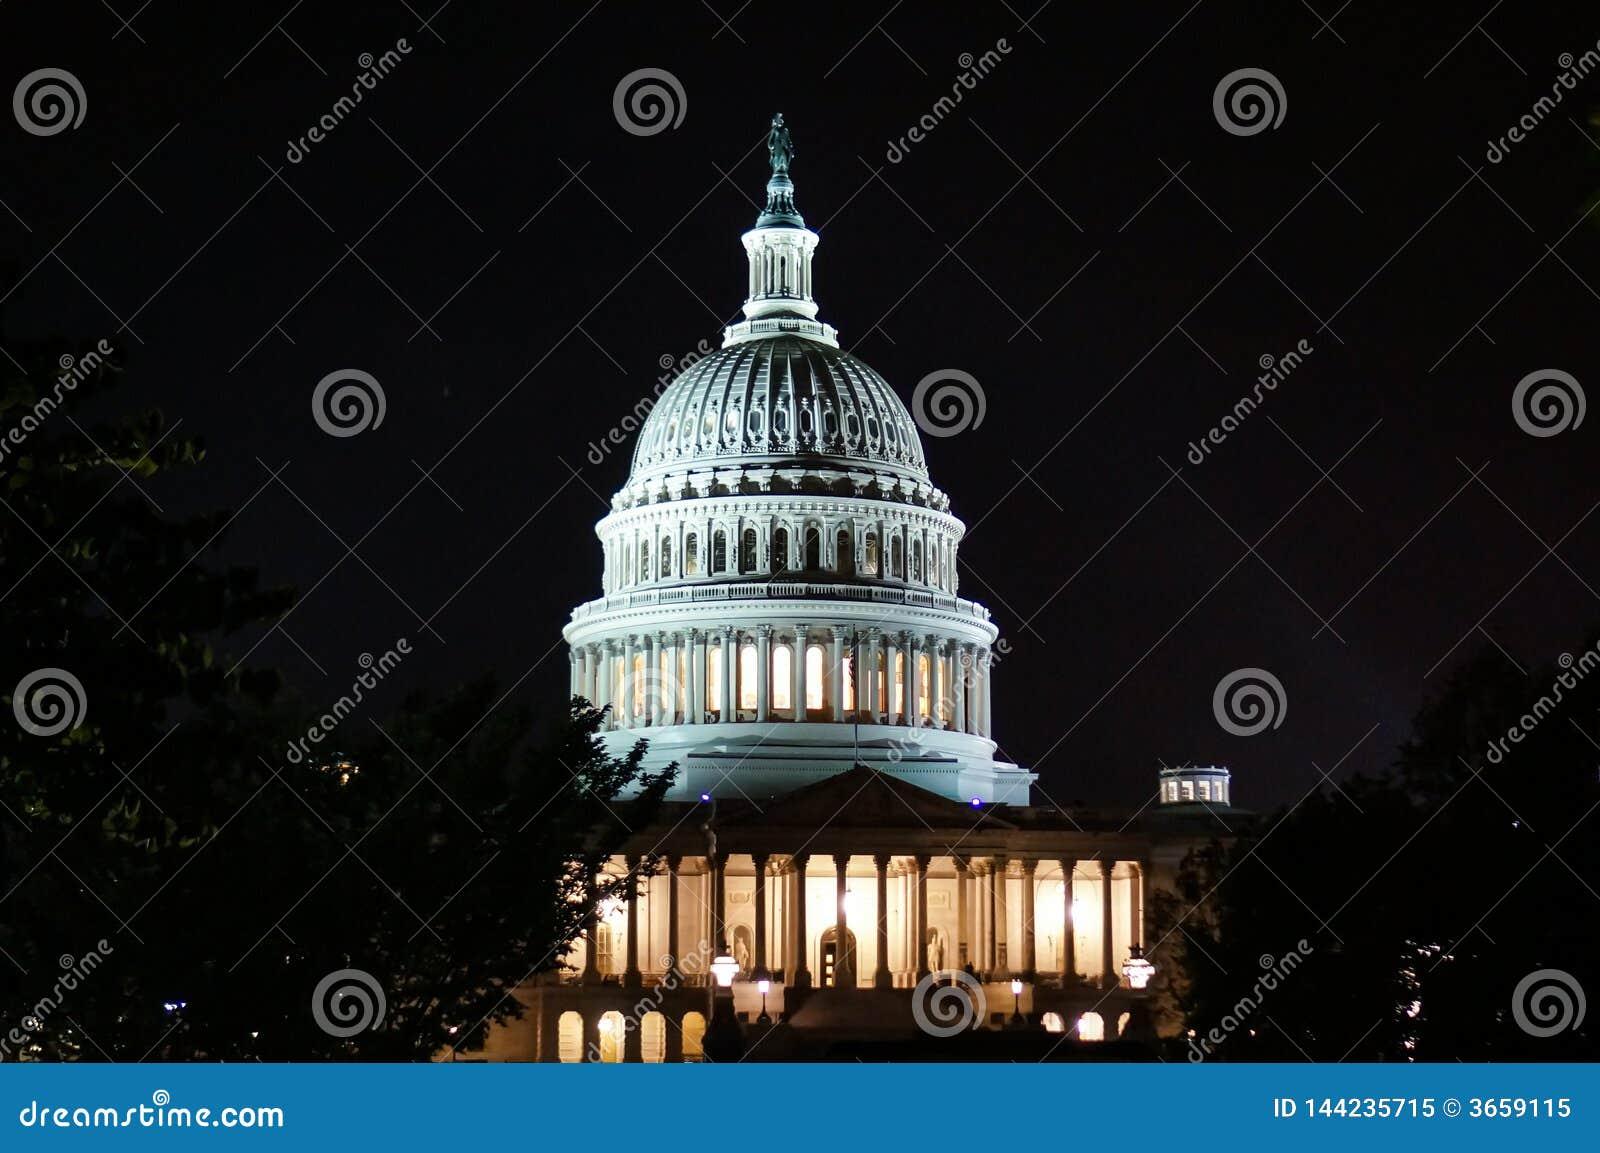 Waszyngton, DC, usa 08 18 2018 USA Capitol budynek z kolumnami z bliska noc